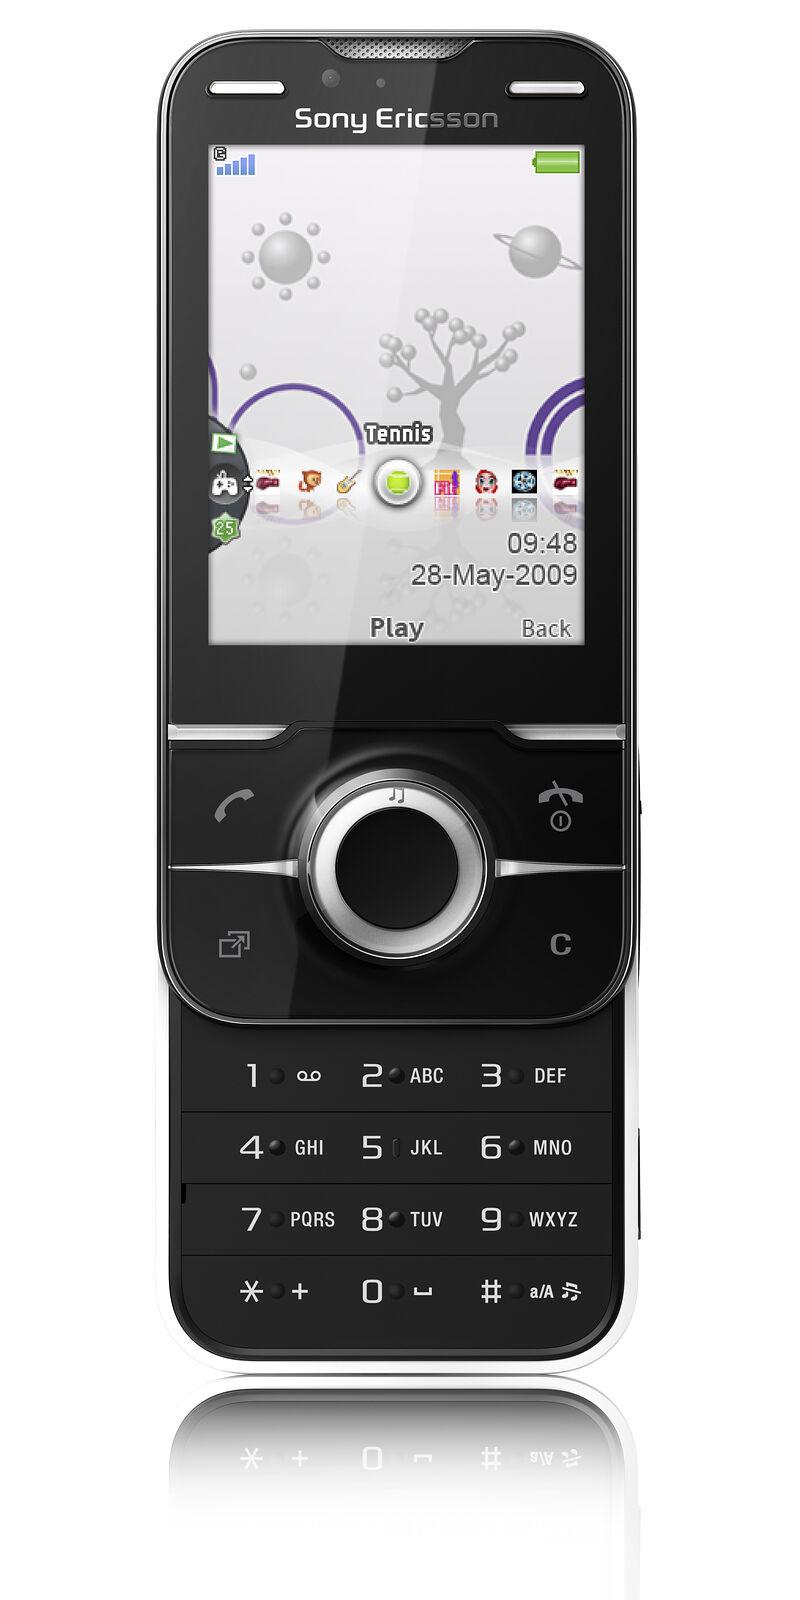 Sony Ericsson Yari